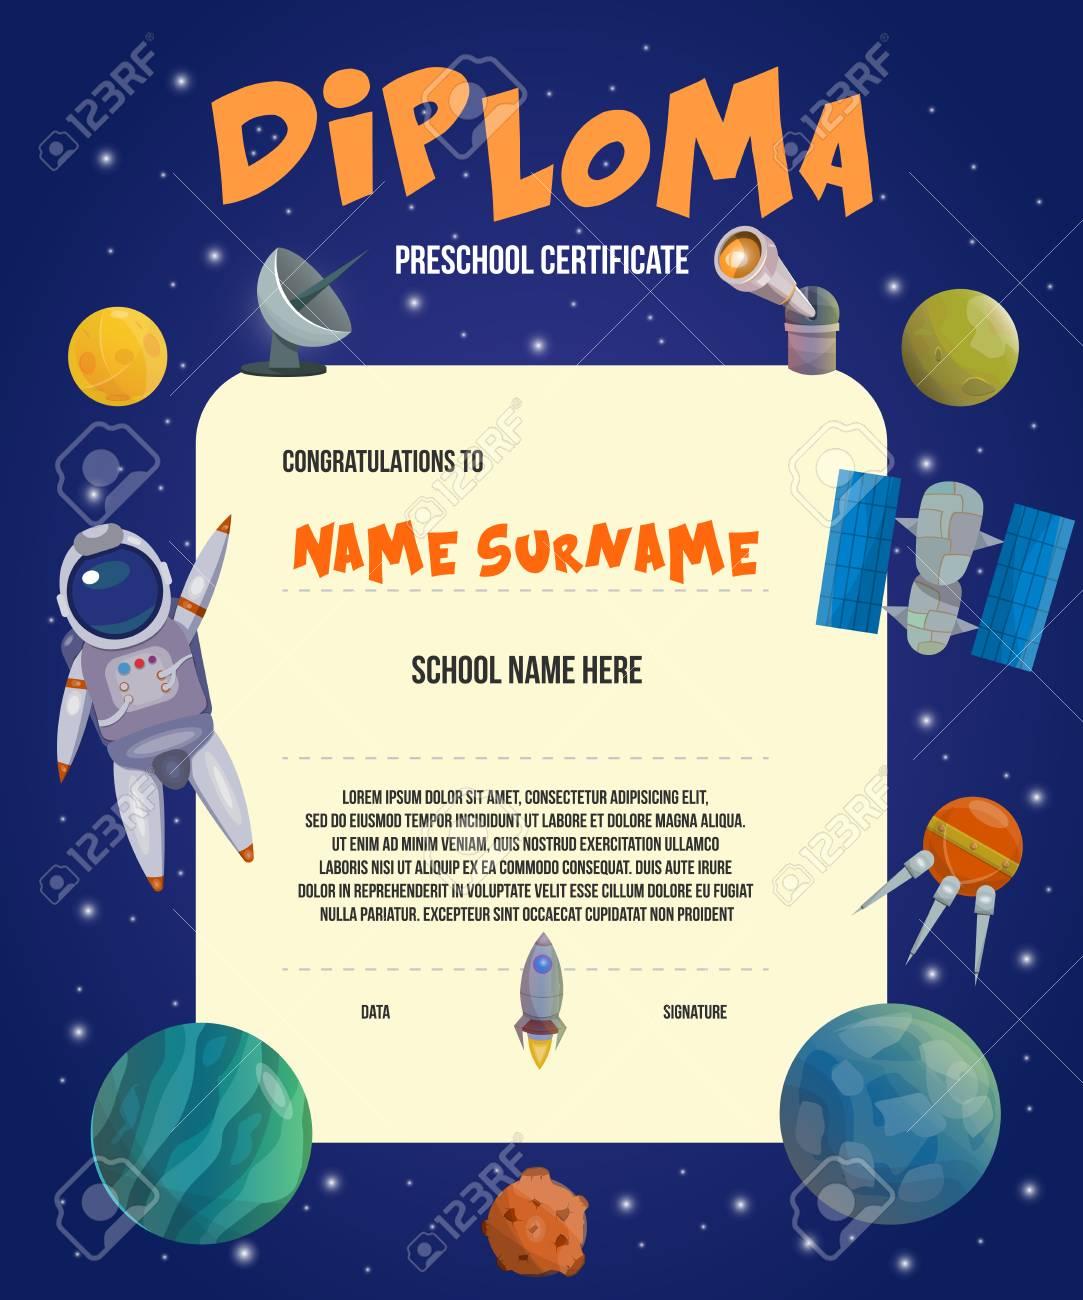 Colored Space Universe Card Or Diploma Preschool Certificate